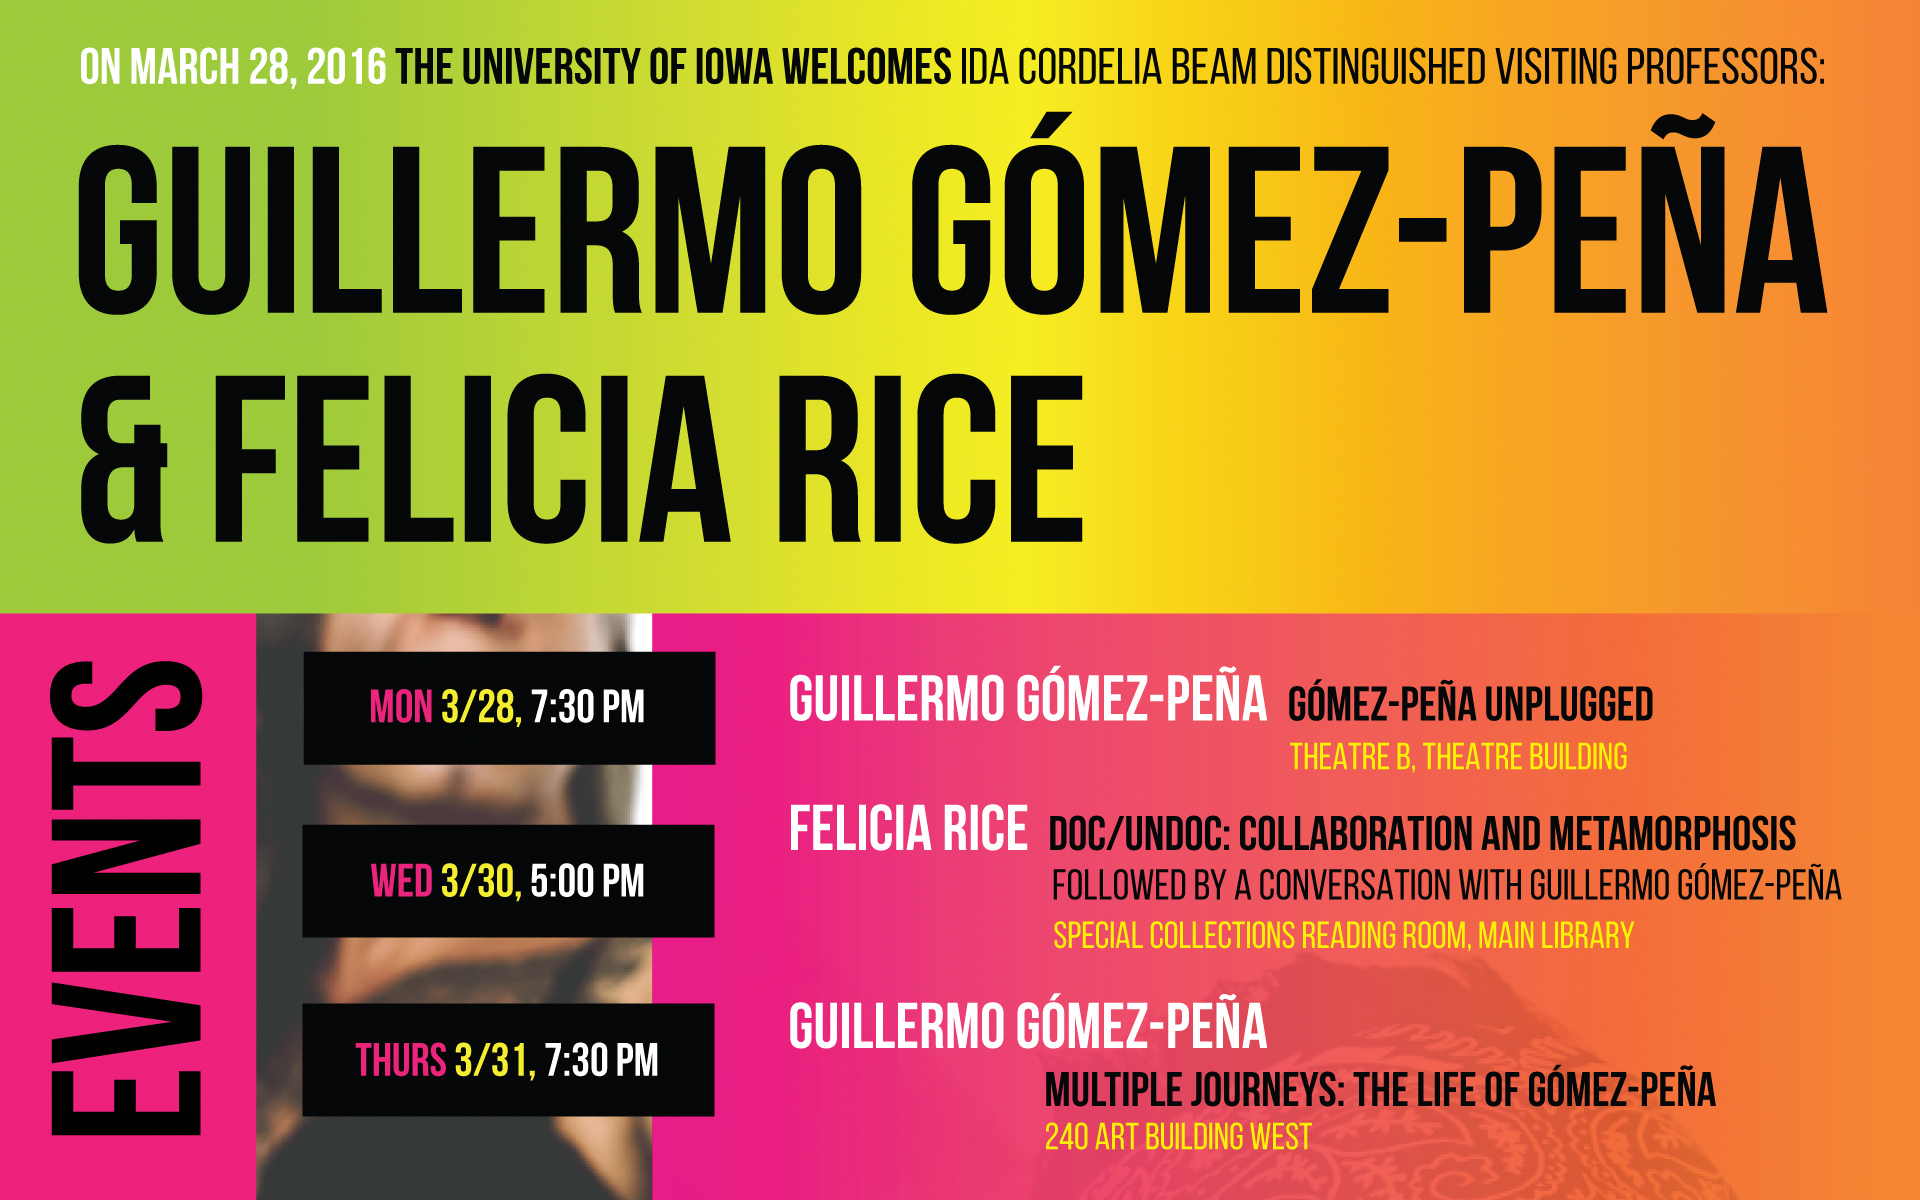 Guillermo Gomez-Pena and Felicia Rice. Ida Beam Visiting Professors. Events in March. More info at arts.uiowa.edu.